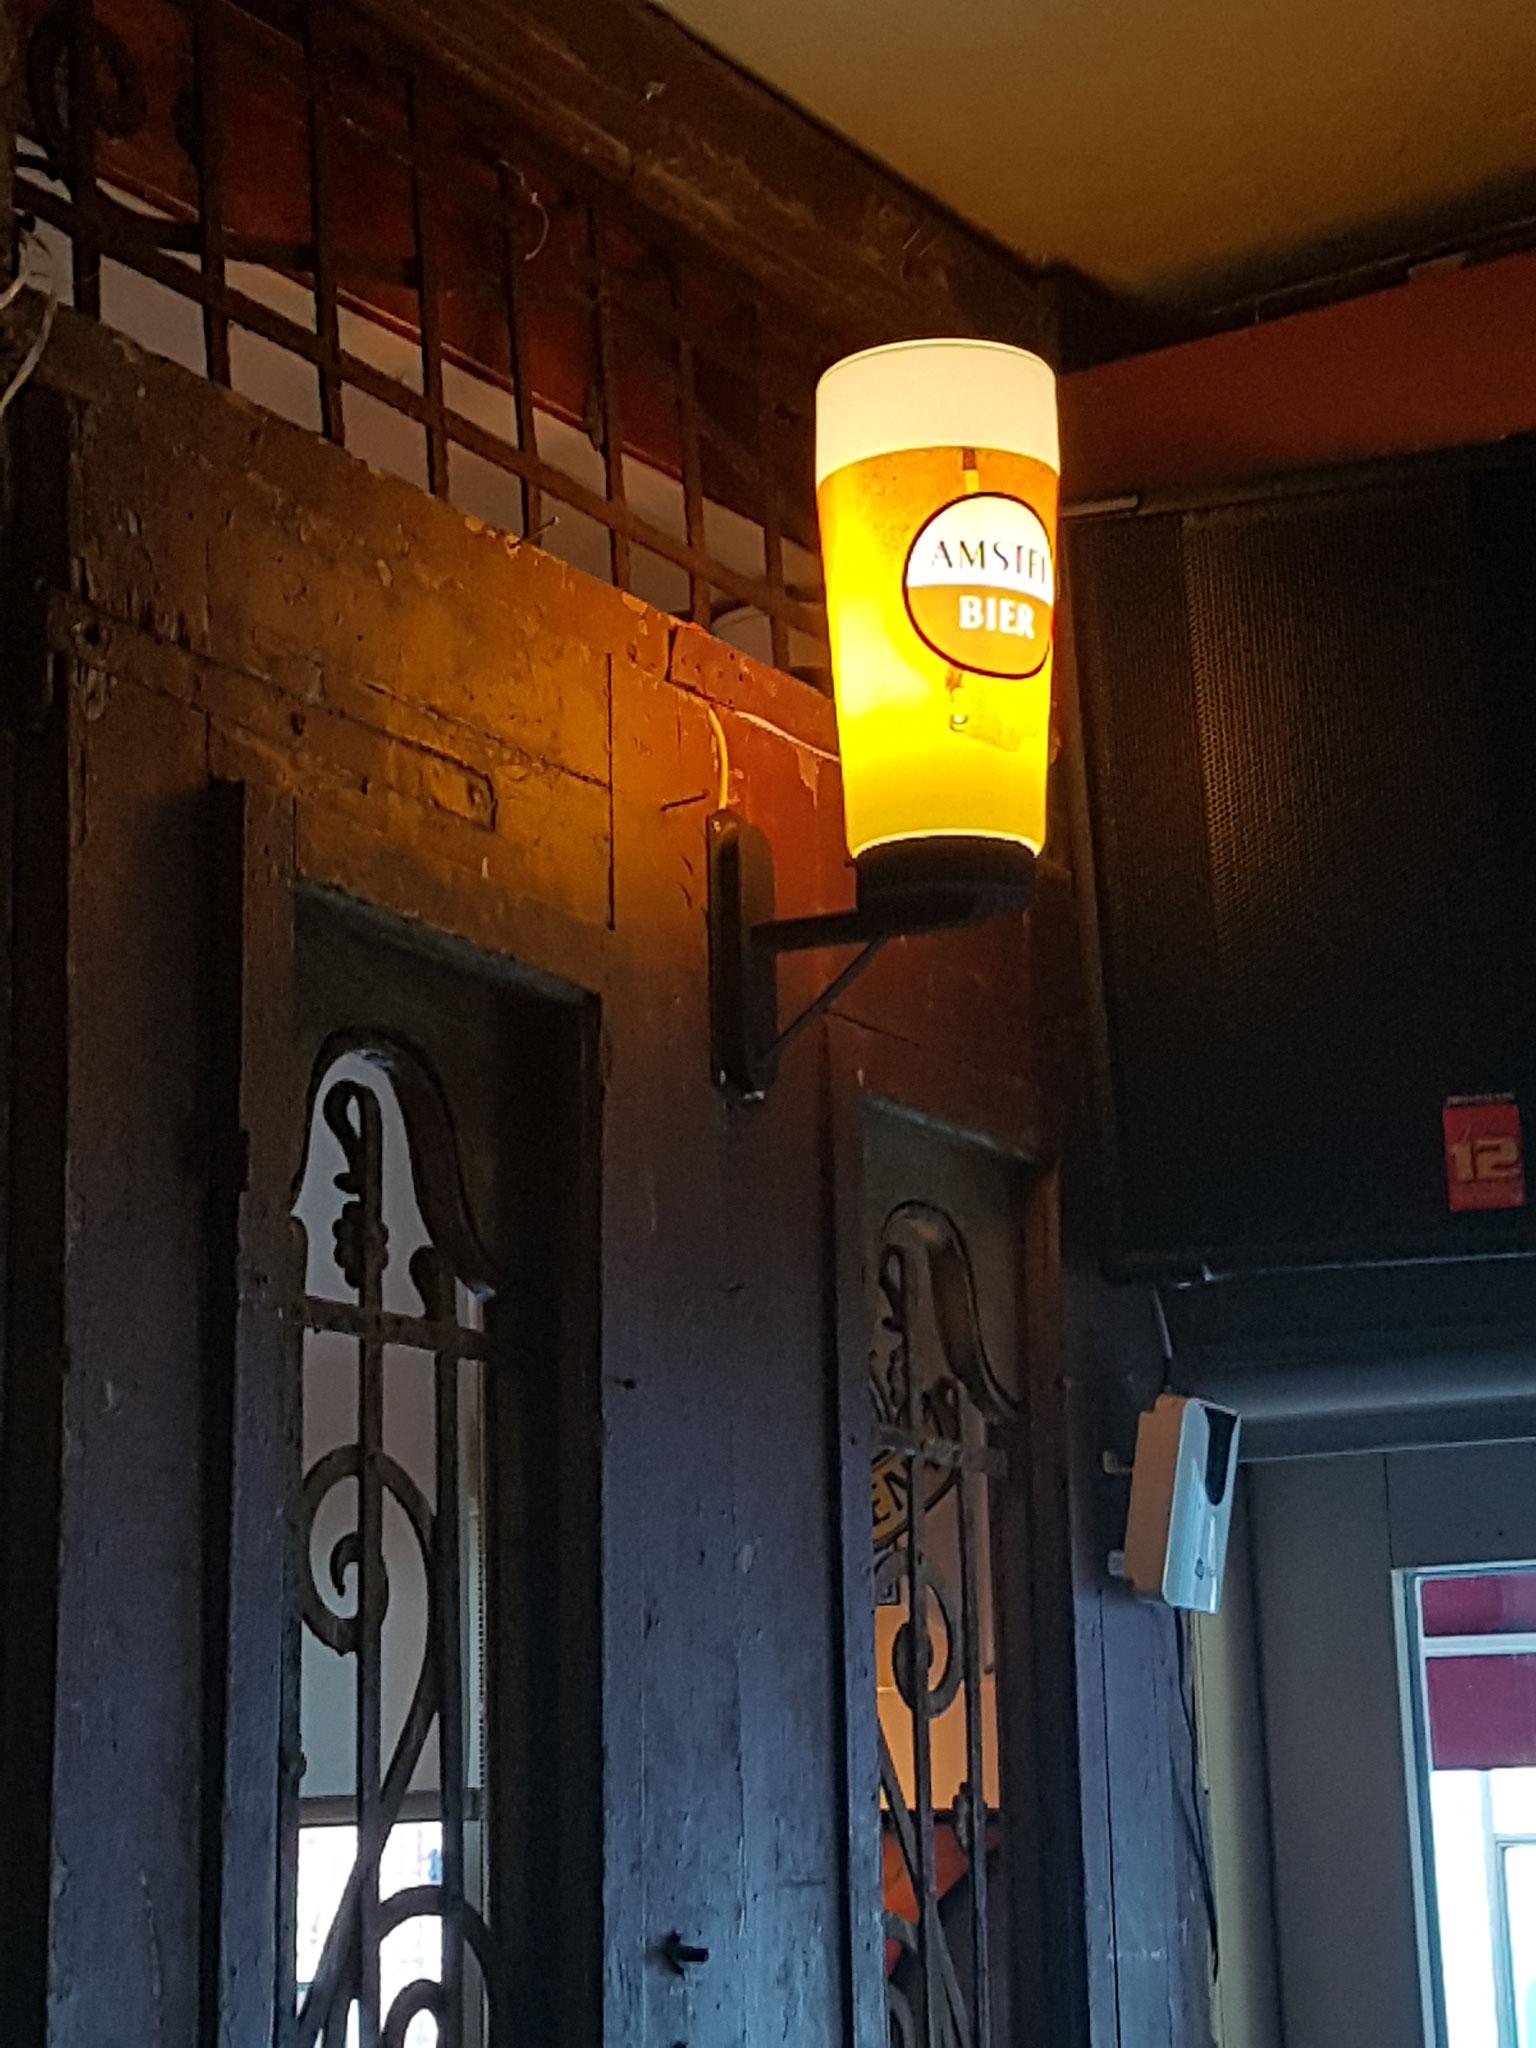 Amstel bier wandlamp